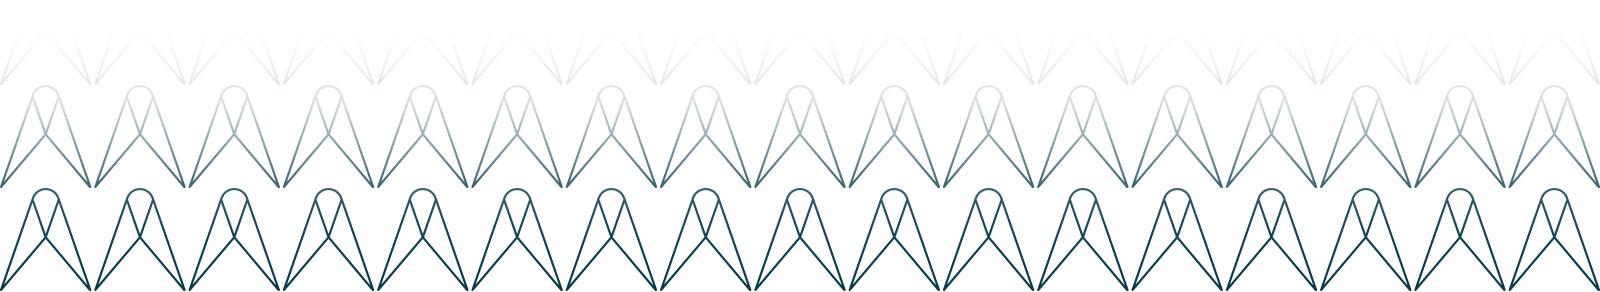 Release notes (9.12) 22 November 2018